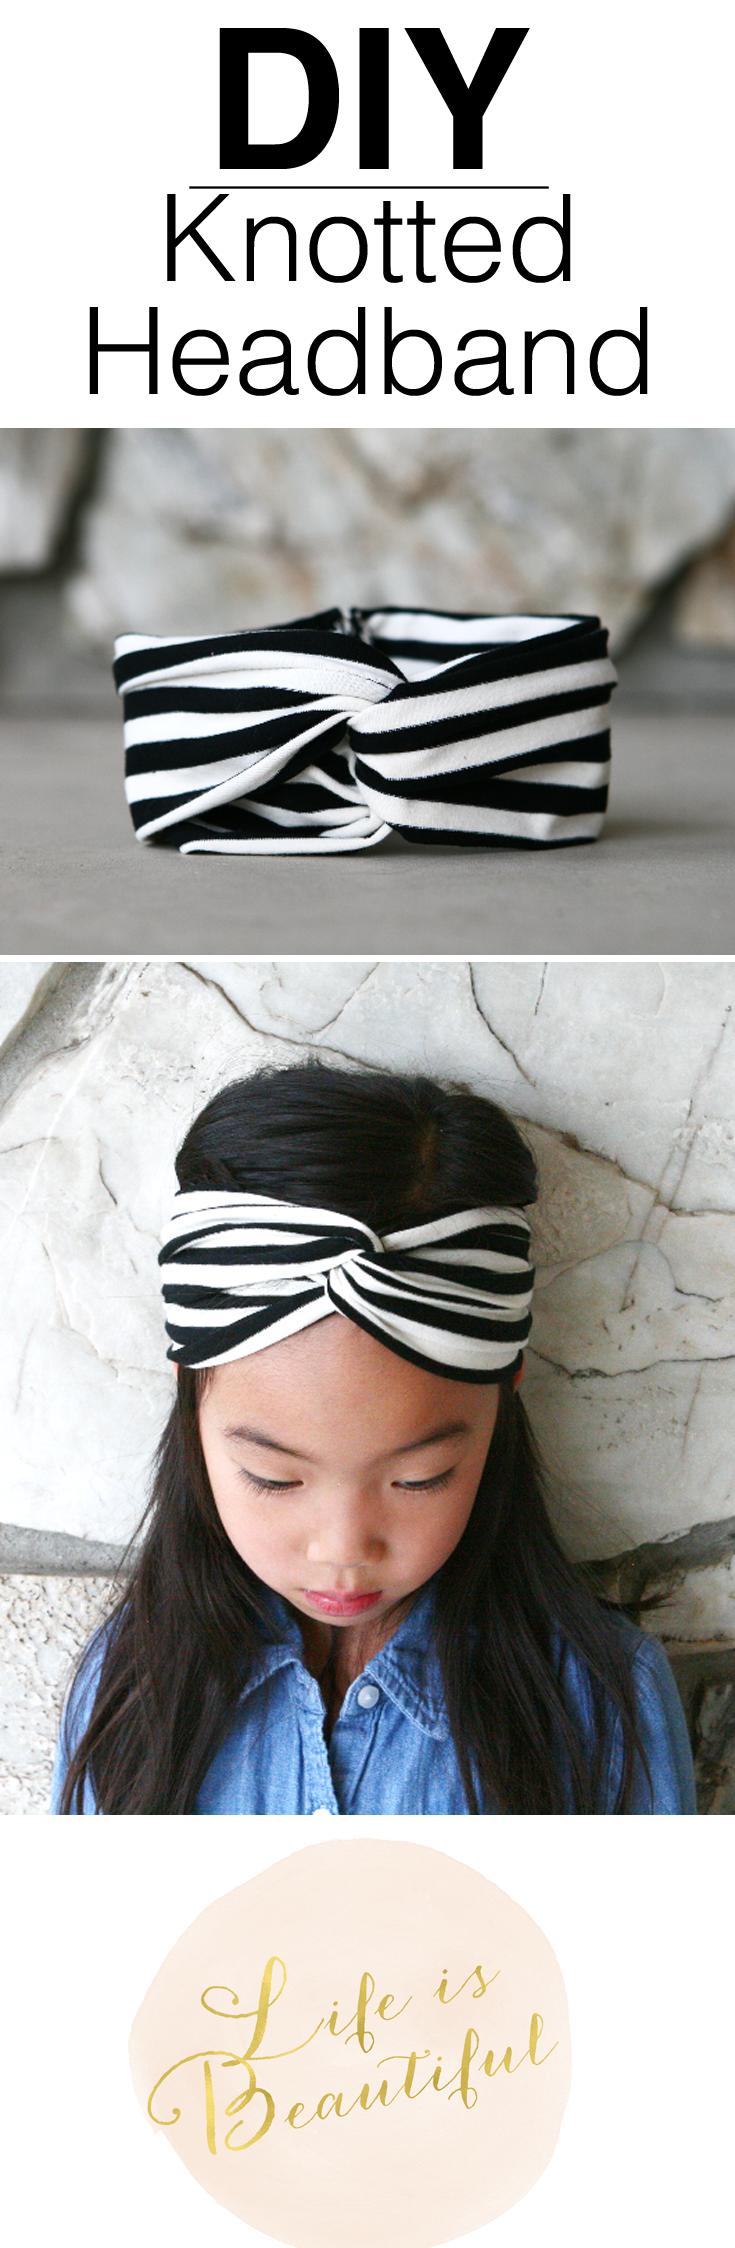 DIY Knotted headband Turban Stirnbänder 5f303a29b1f